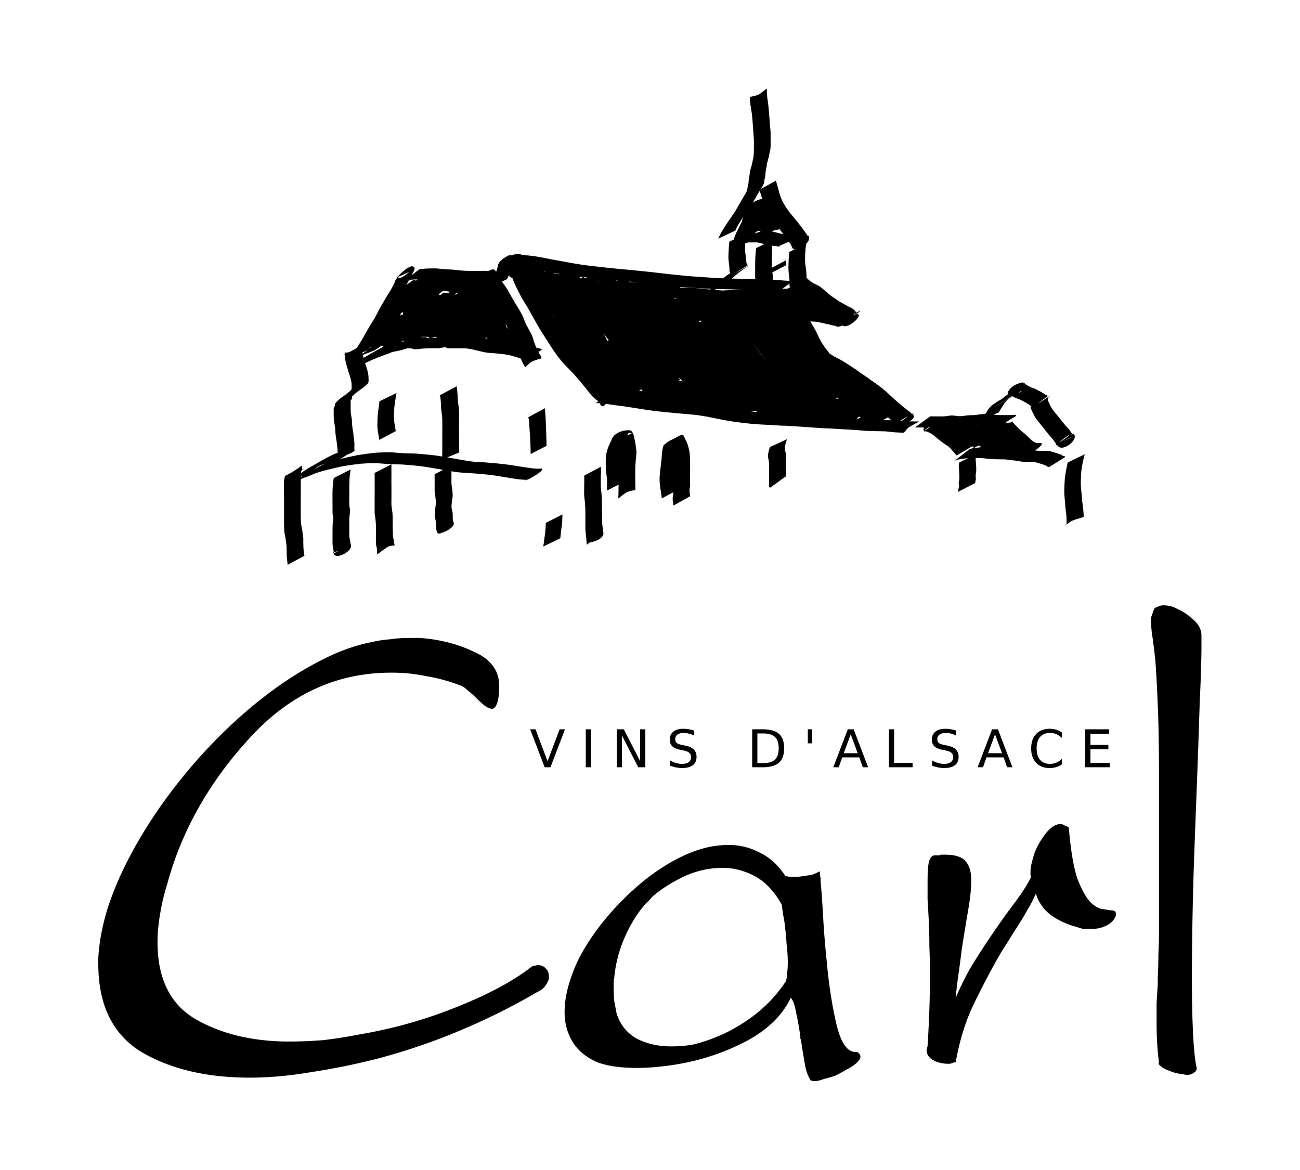 logo Carl vins d'Alsace, vins bio André Carl